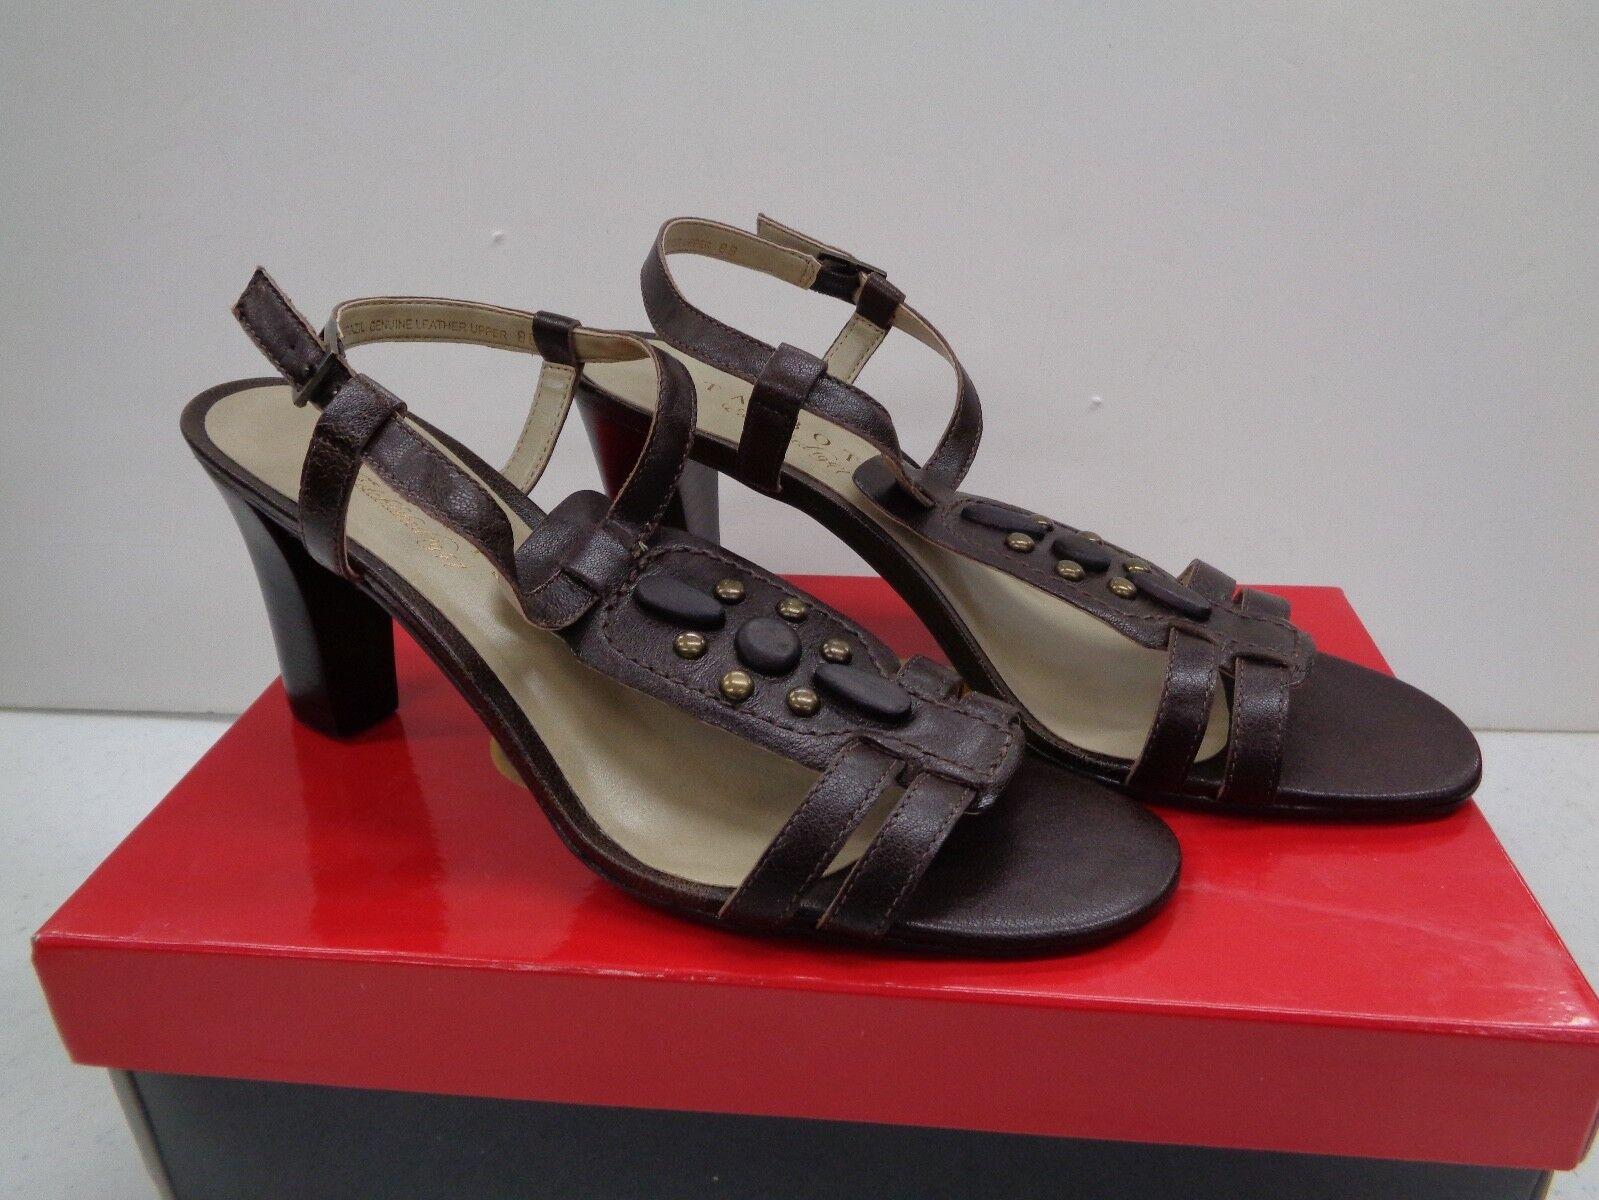 Talbots Ravis Bittersweet Heels scarpe NEVER WORN 8M BRAND NEW IN BOX Retail 129